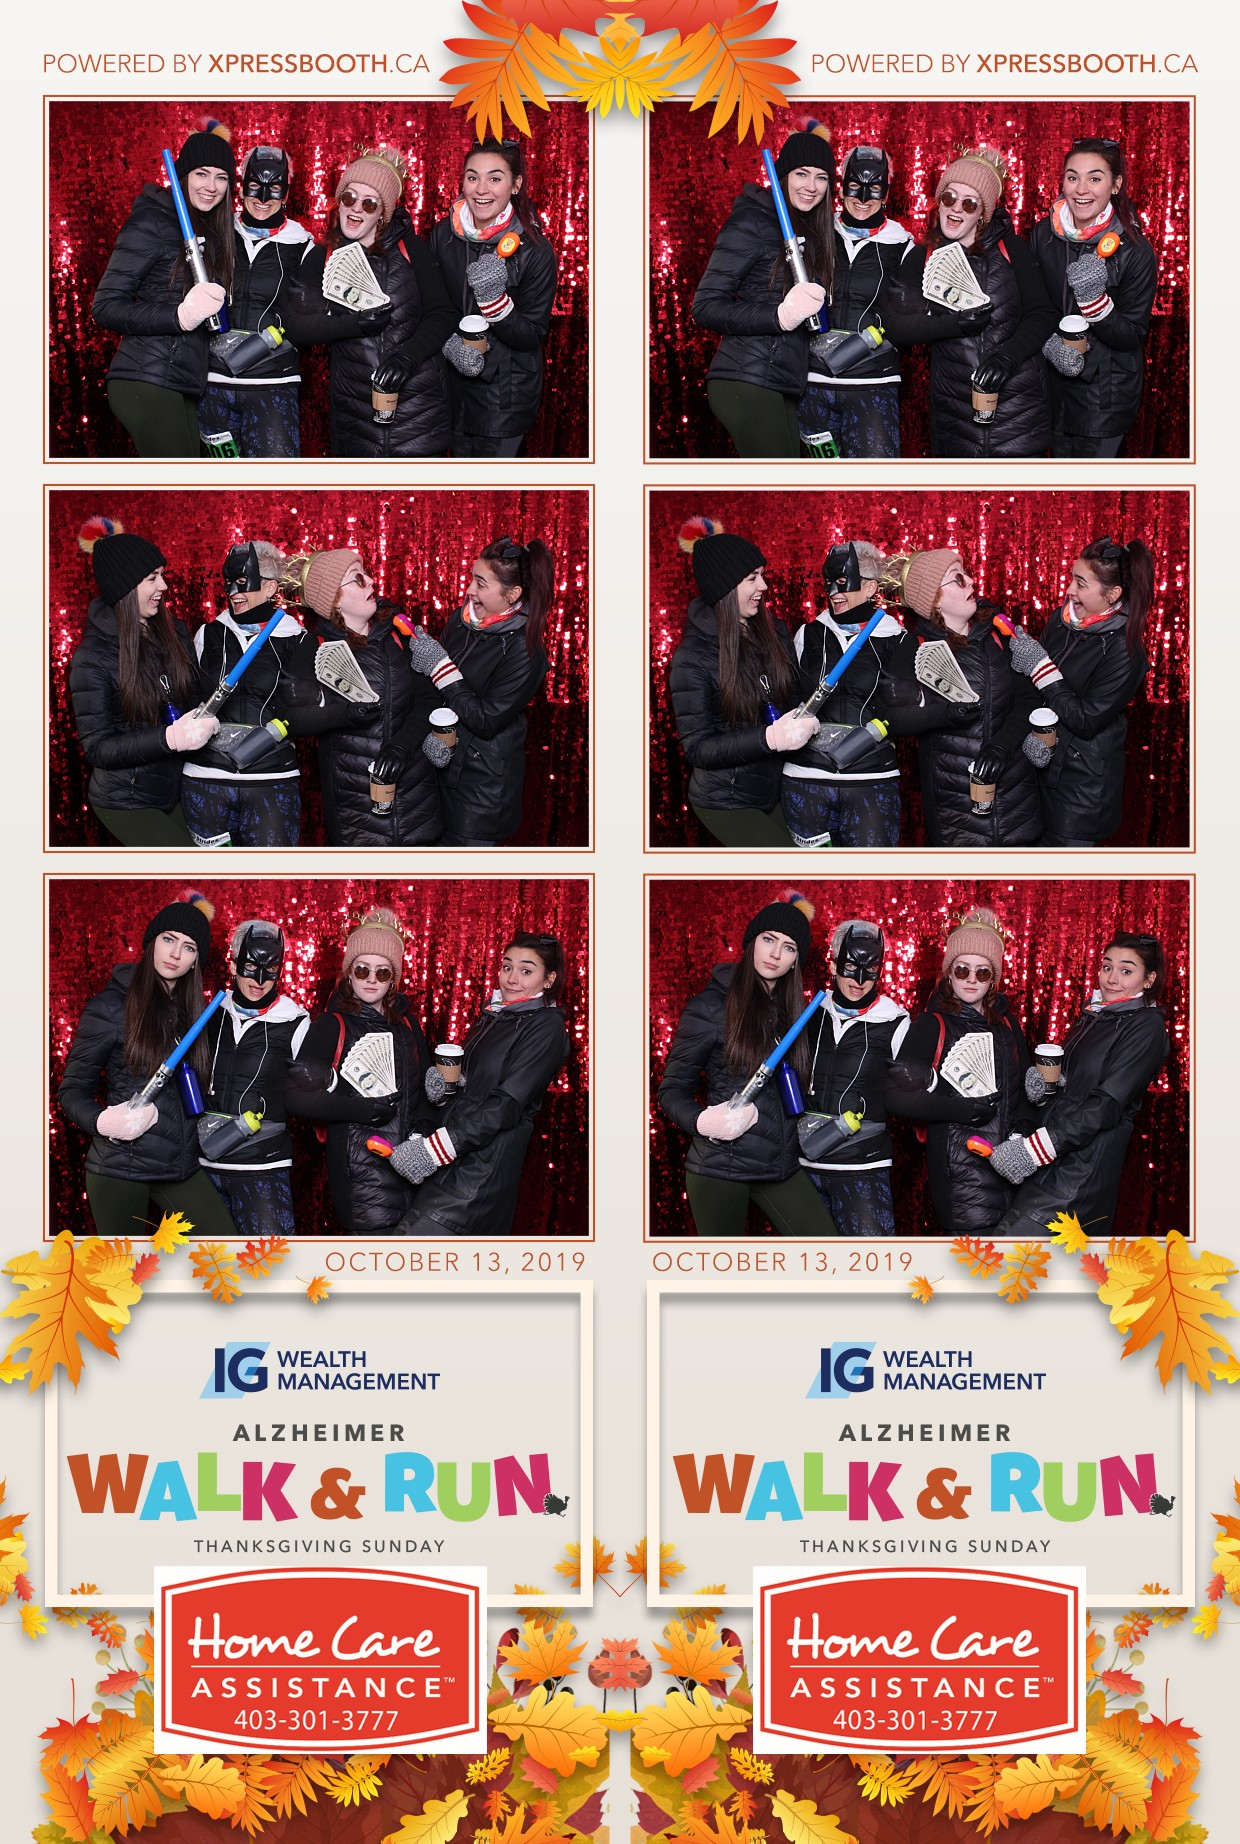 WalkRunAlzheimerSociety-0123-PRINT